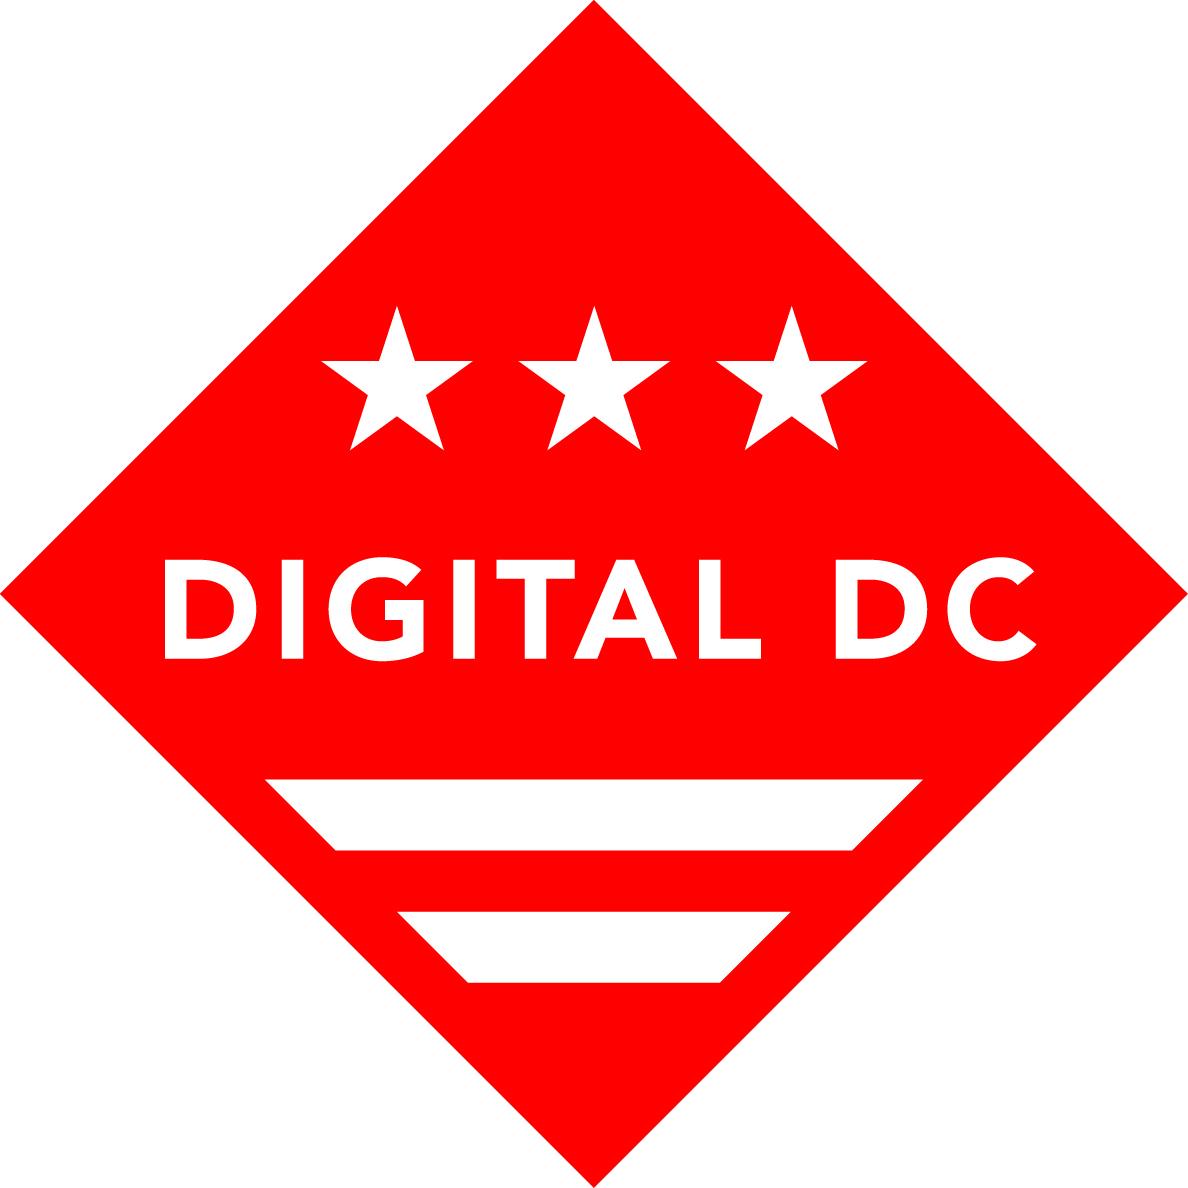 logo - digital dc.jpg